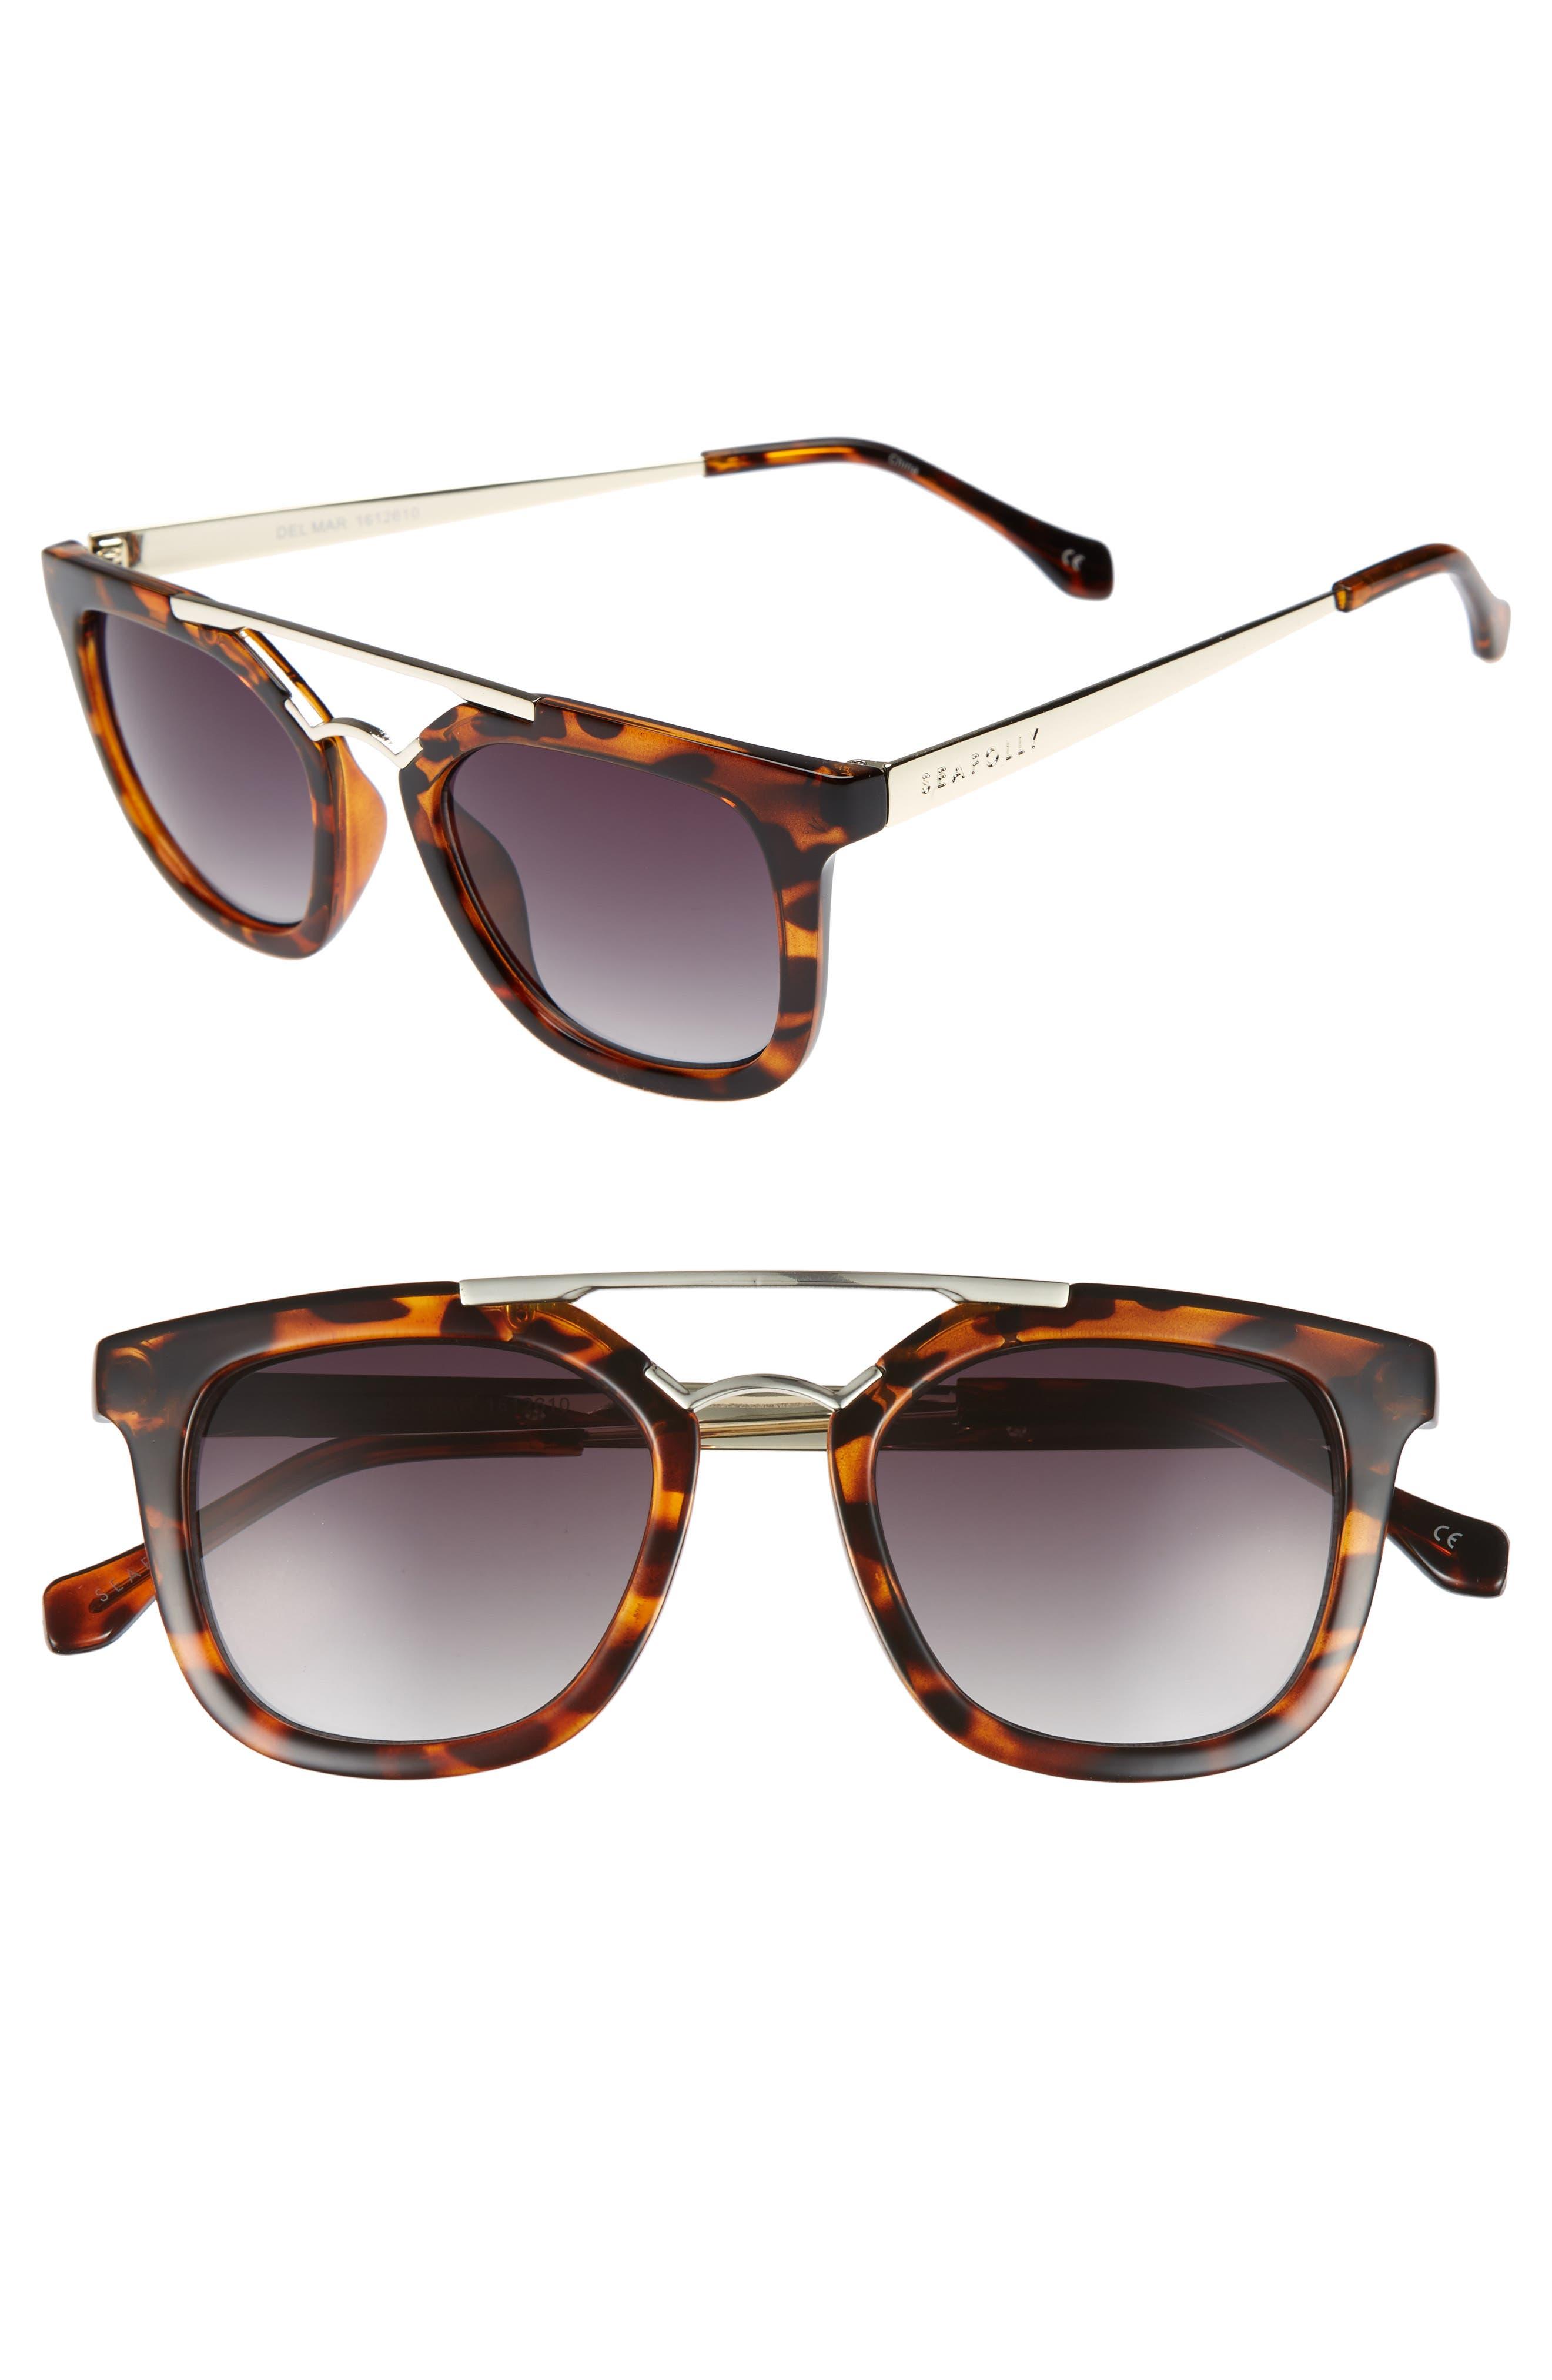 Del Mar 49mm Tortiseshell Aviator Sunglasses,                             Main thumbnail 1, color,                             DARK TORT